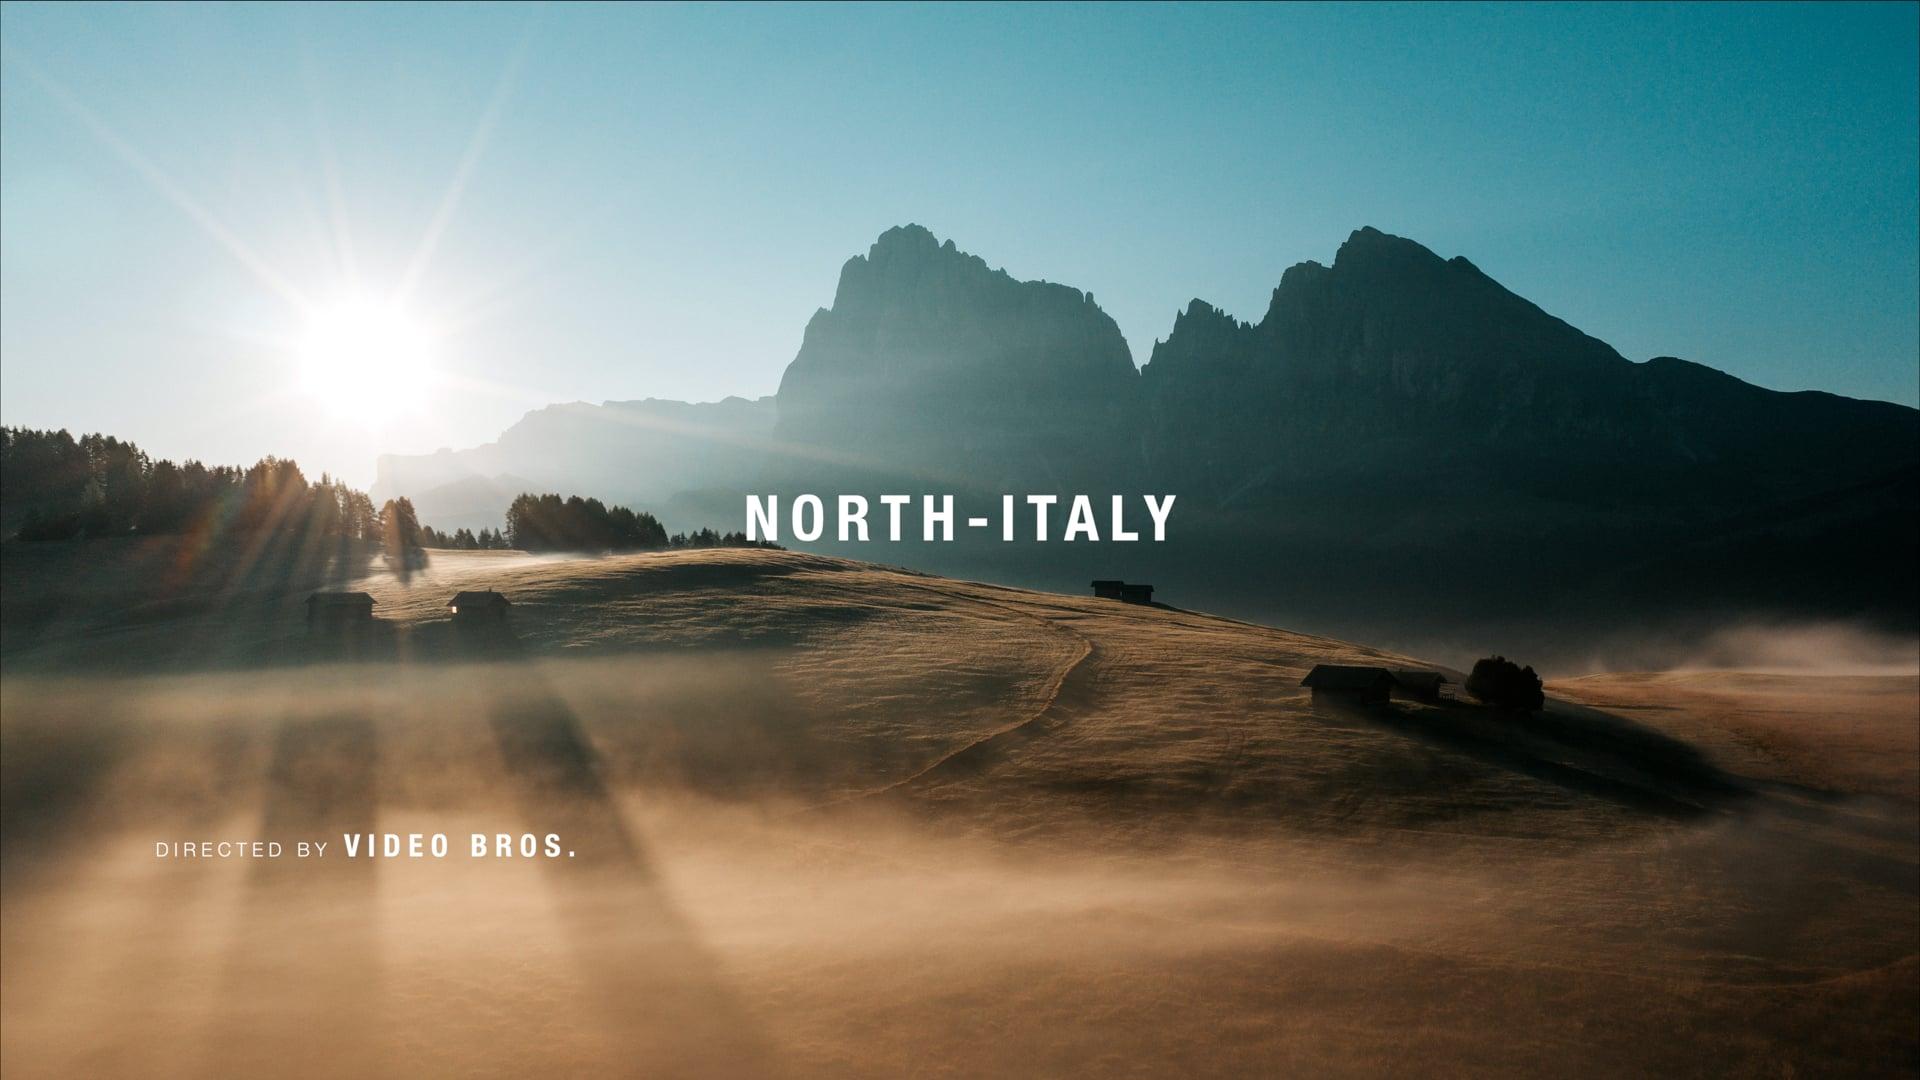 North-Italy